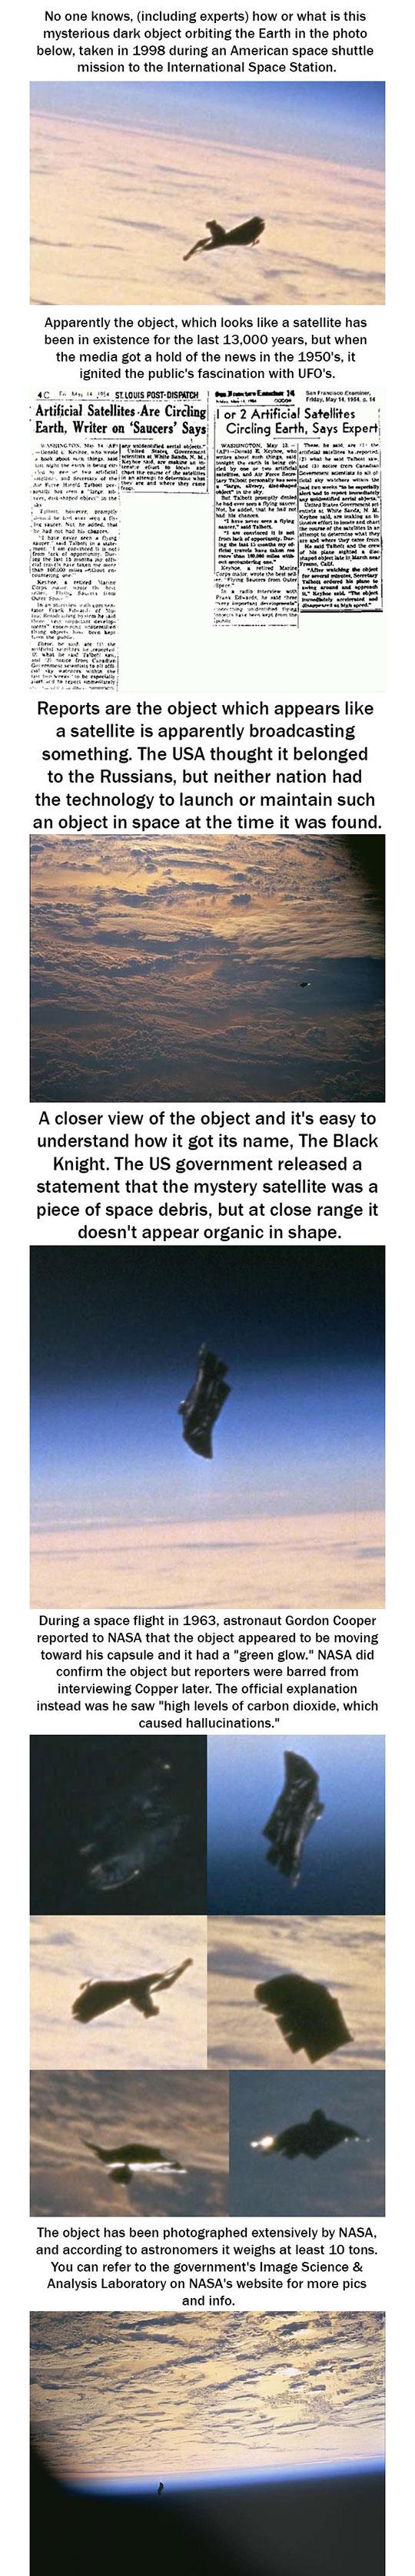 The Black Knight: Alien Satellite